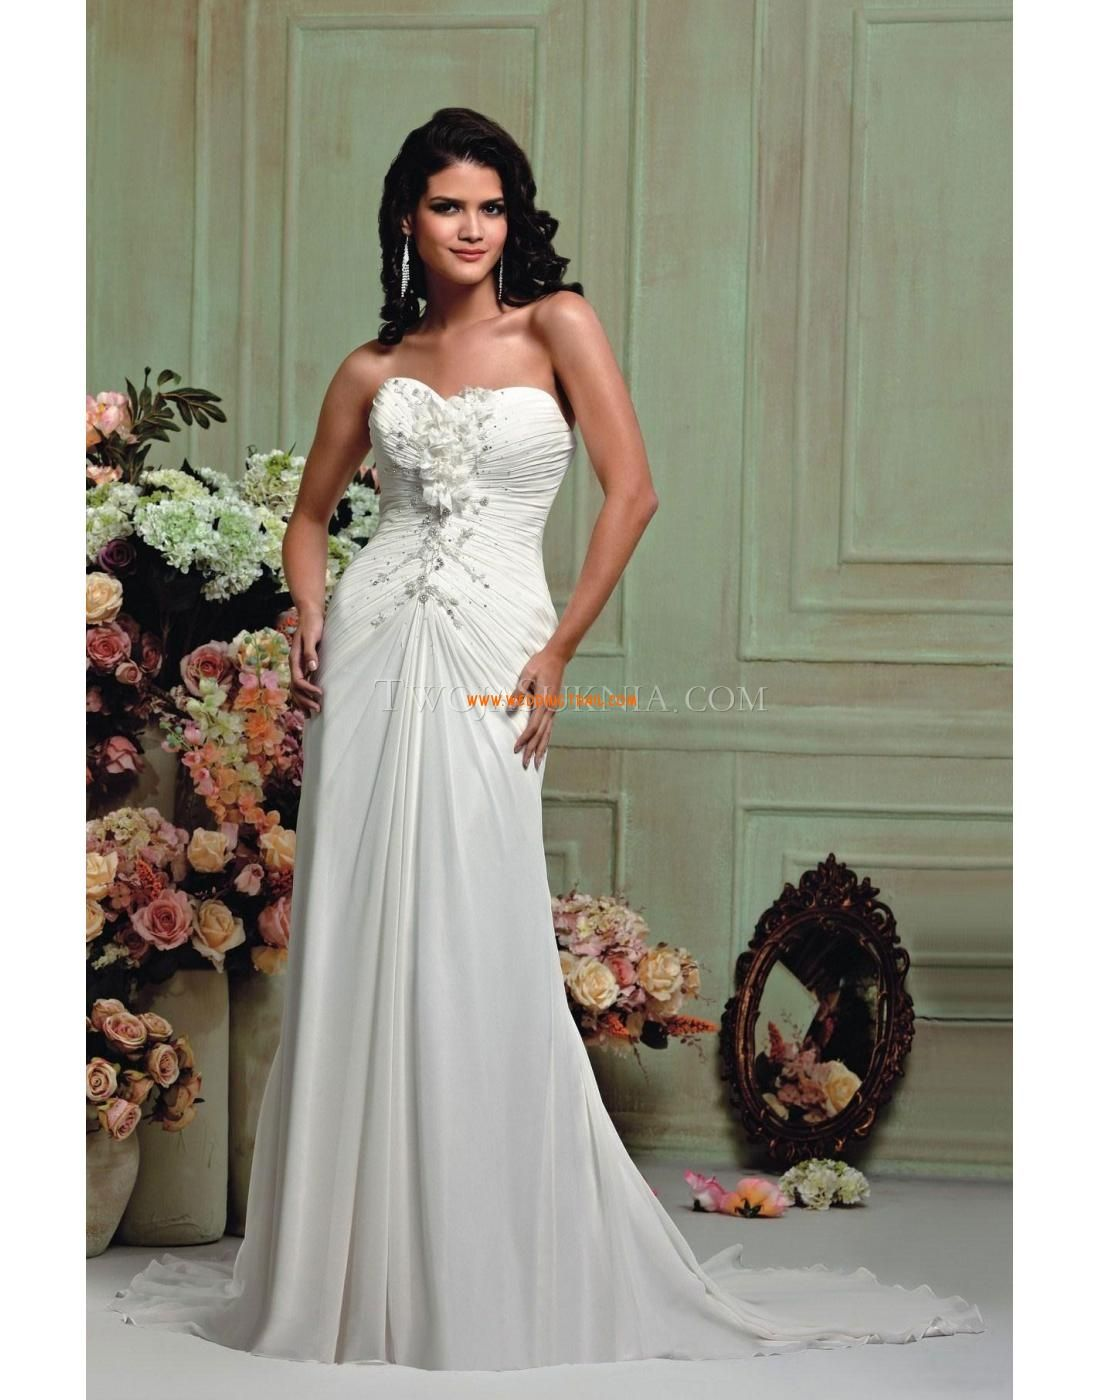 Wedding Dress Veromia VR 61201 Veromia